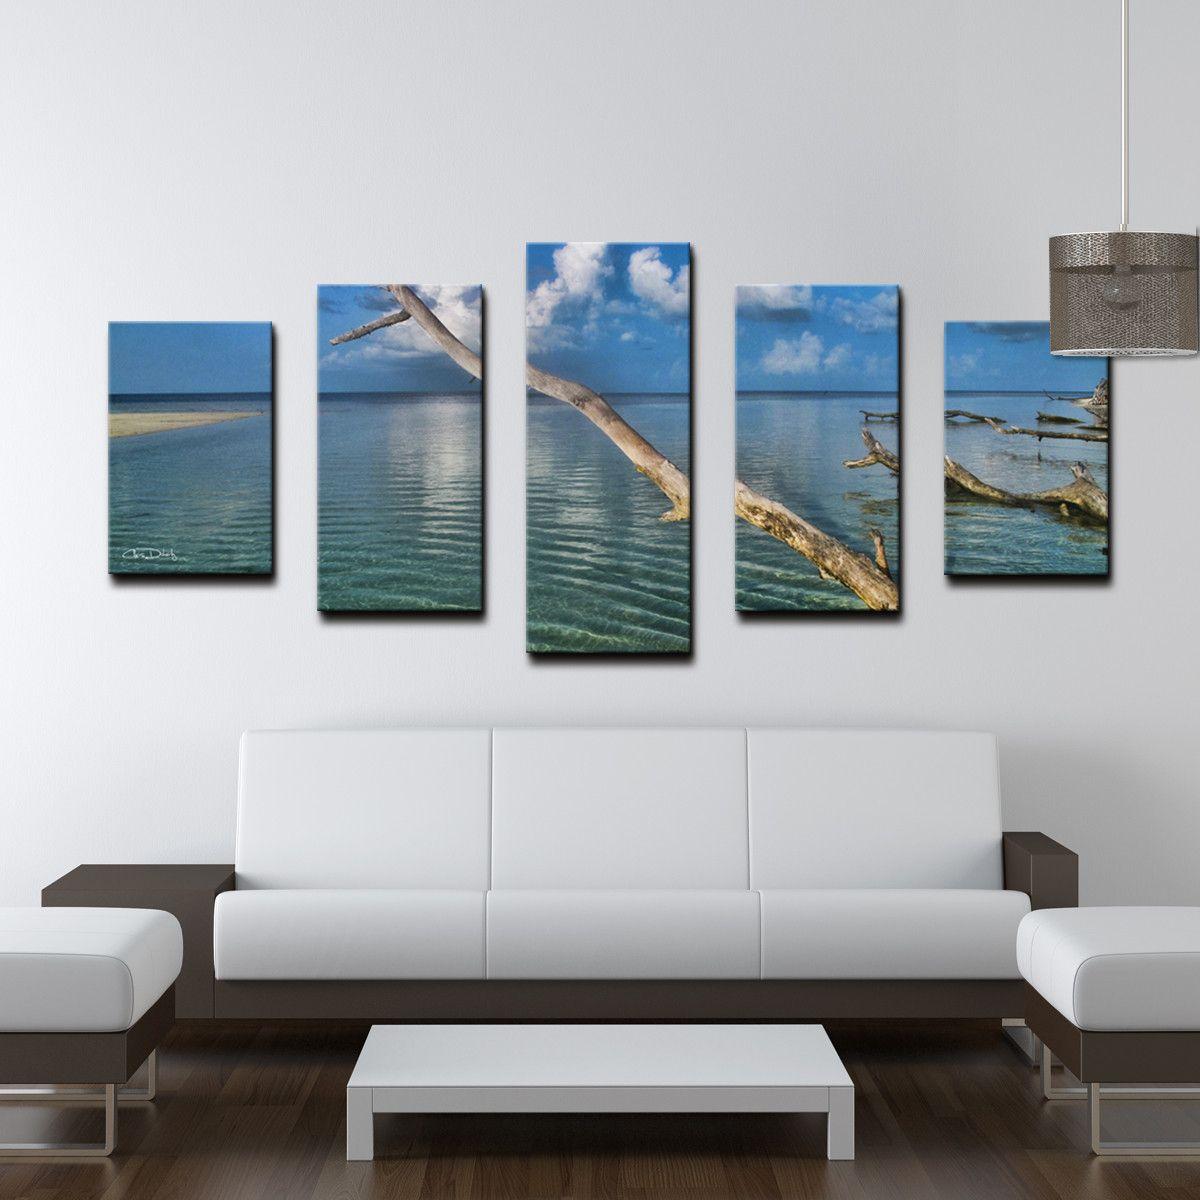 Chris Doherty 'Grand Bahama' 5-piece Canvas Wall Art | Products ... - Chris Doherty 'Grand Bahama' 5-piece Canvas Wall Art